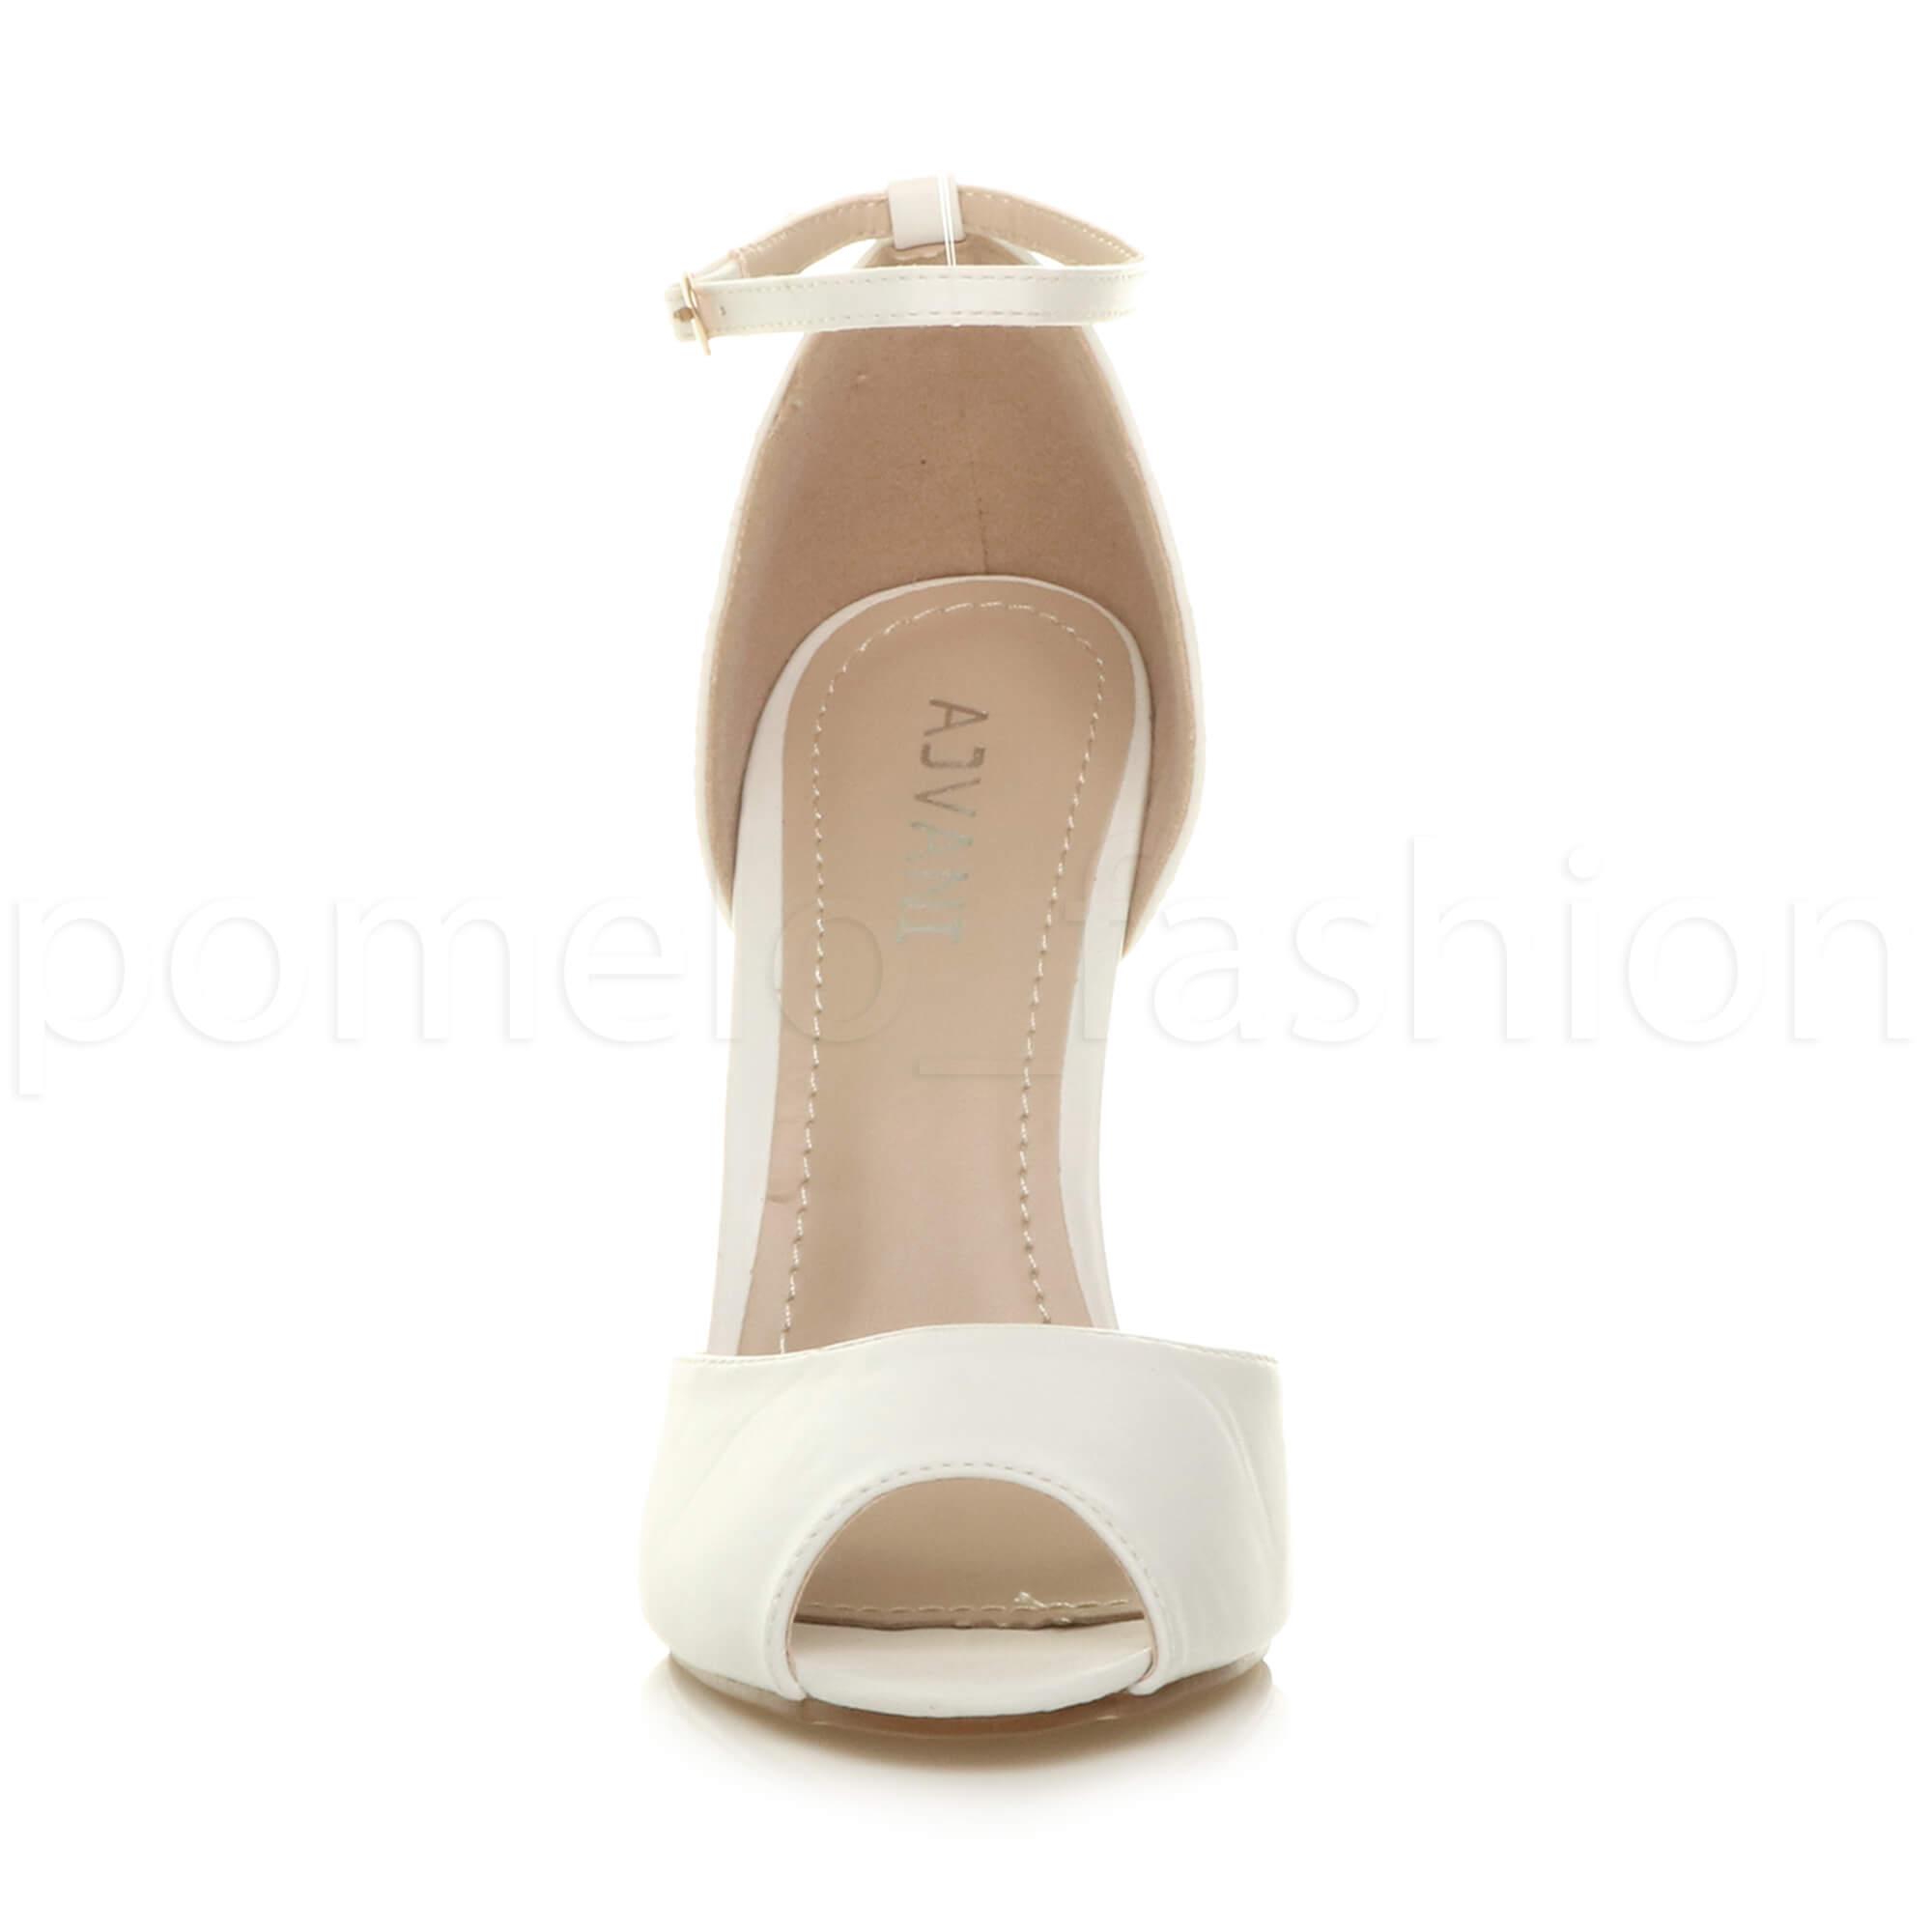 WOMENS-LADIES-HIGH-HEEL-WEDDING-BRIDESMAID-EVENING-STILETTOS-PEEP-TOE-SHOES-SIZE thumbnail 83